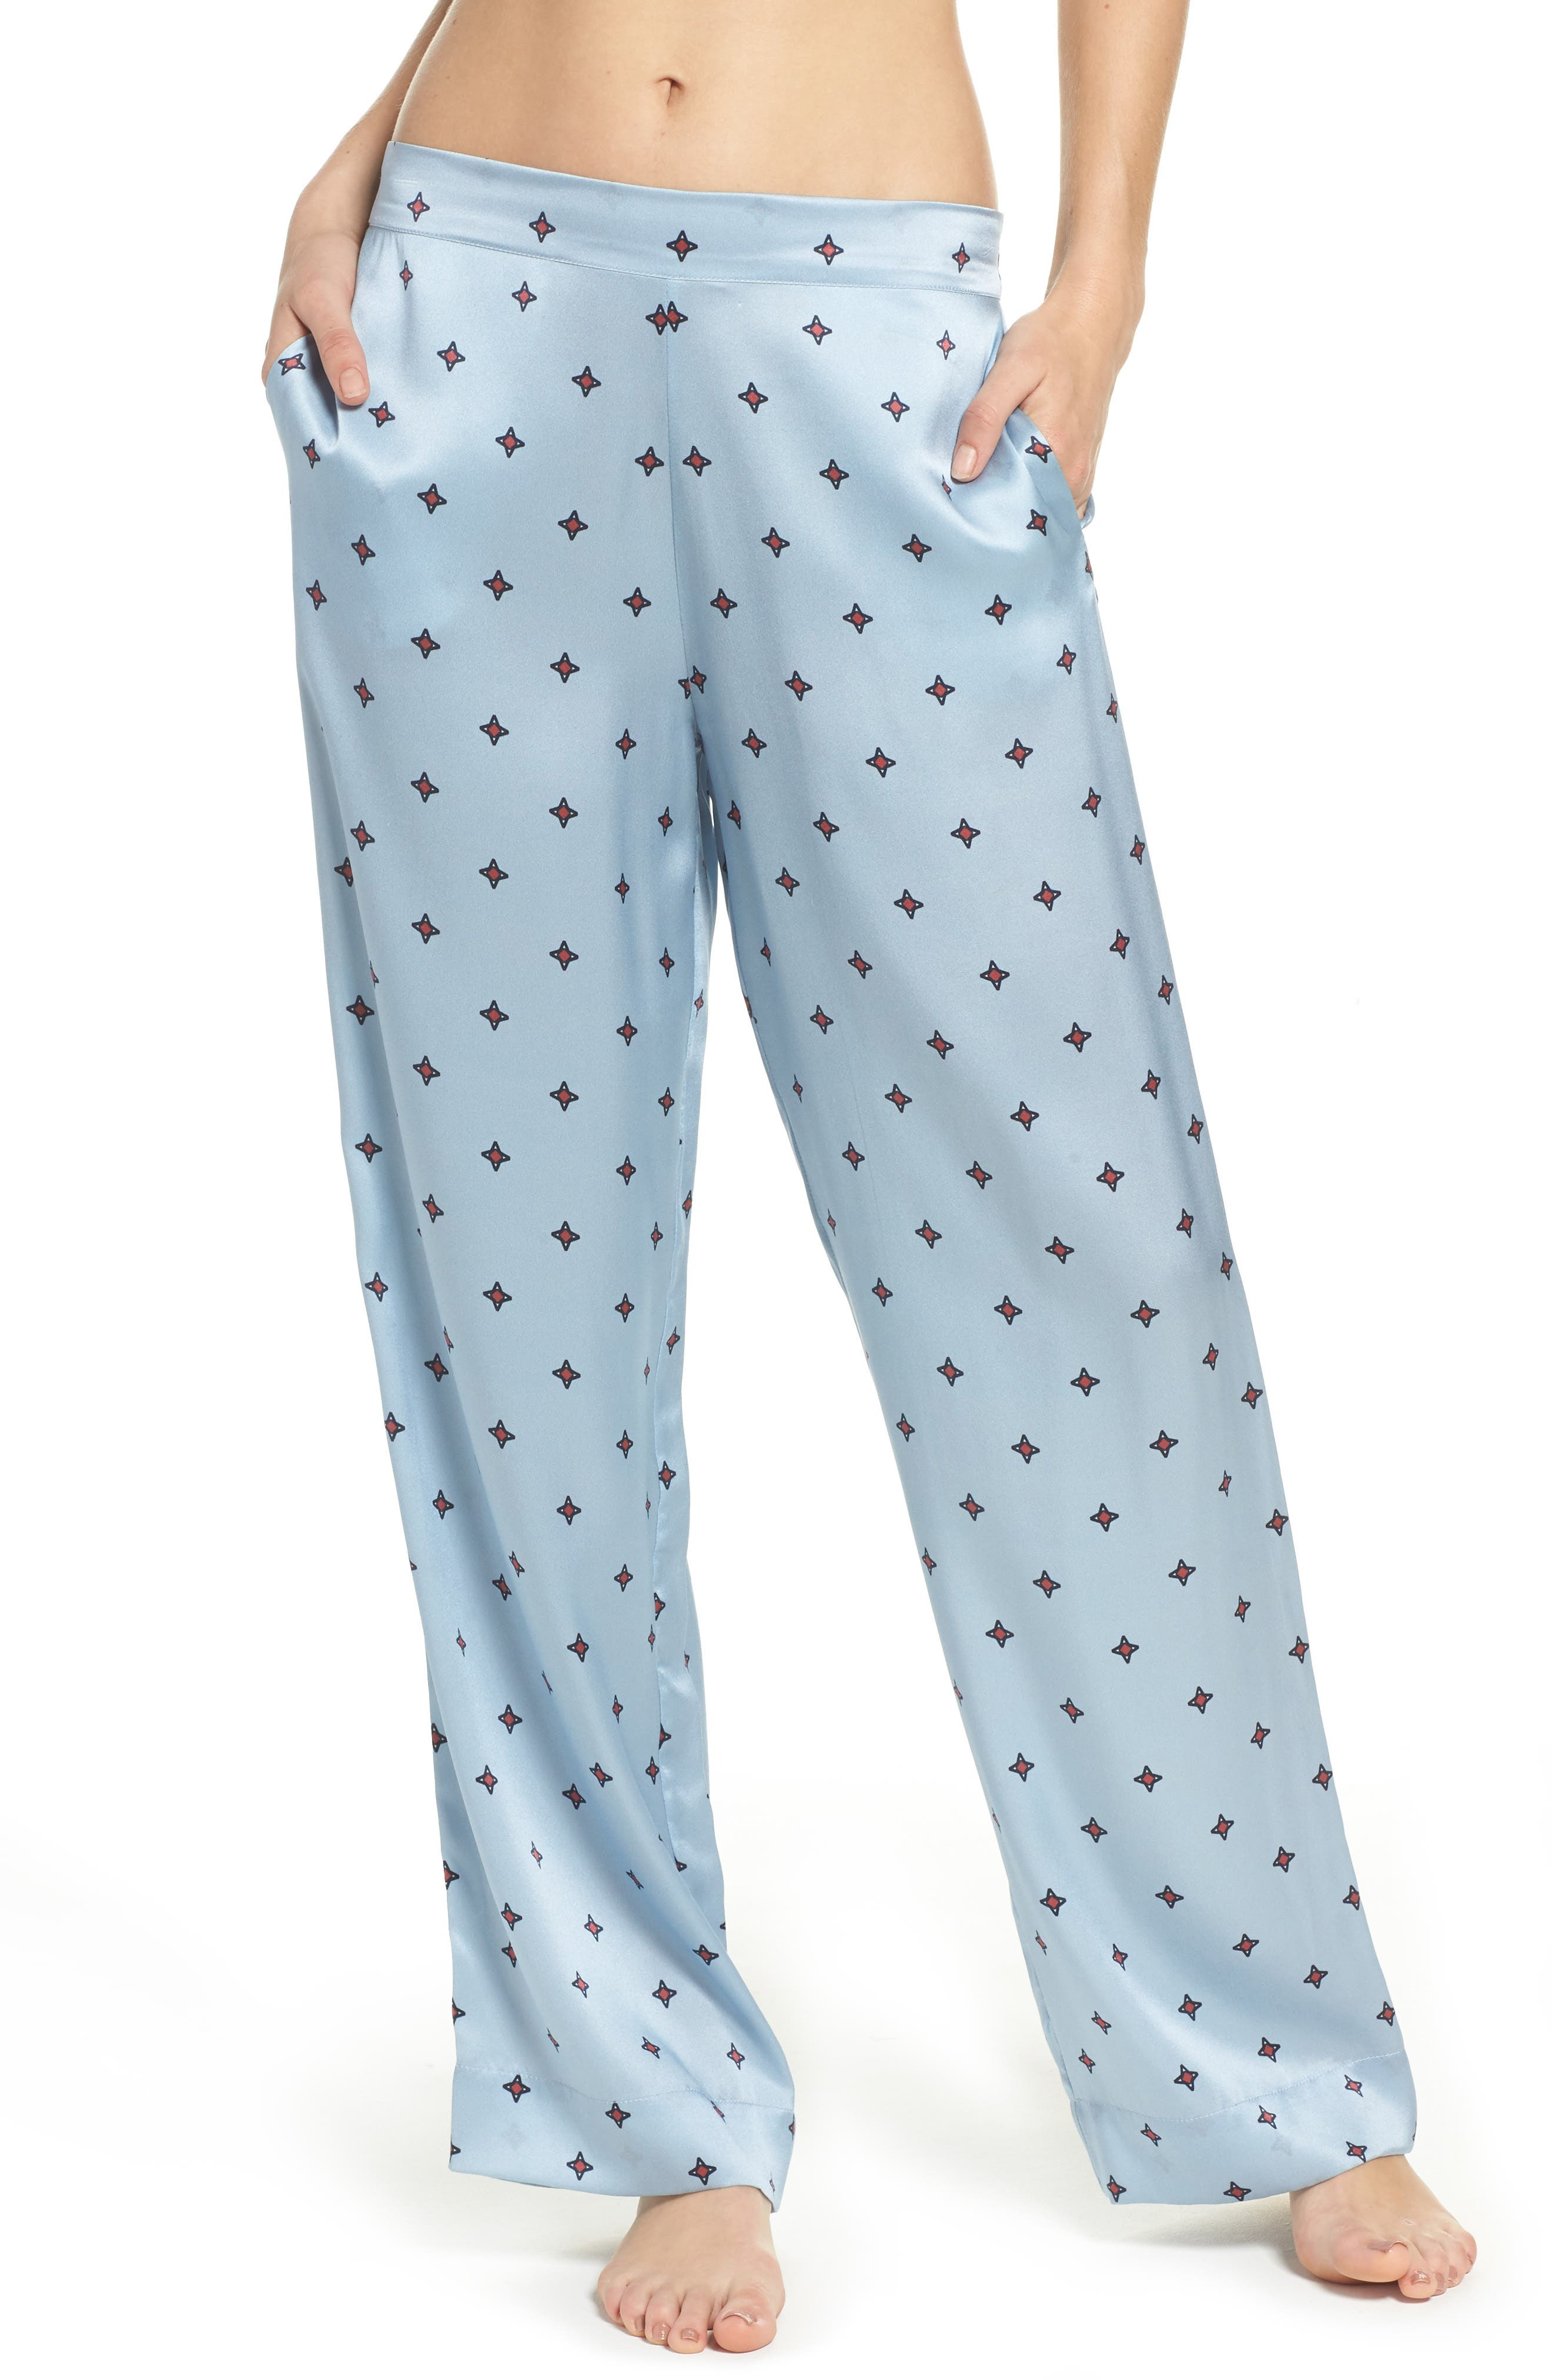 Alternate Image 1 Selected - Asceno by Beautiful Bottoms Print Silk Pajama Pants